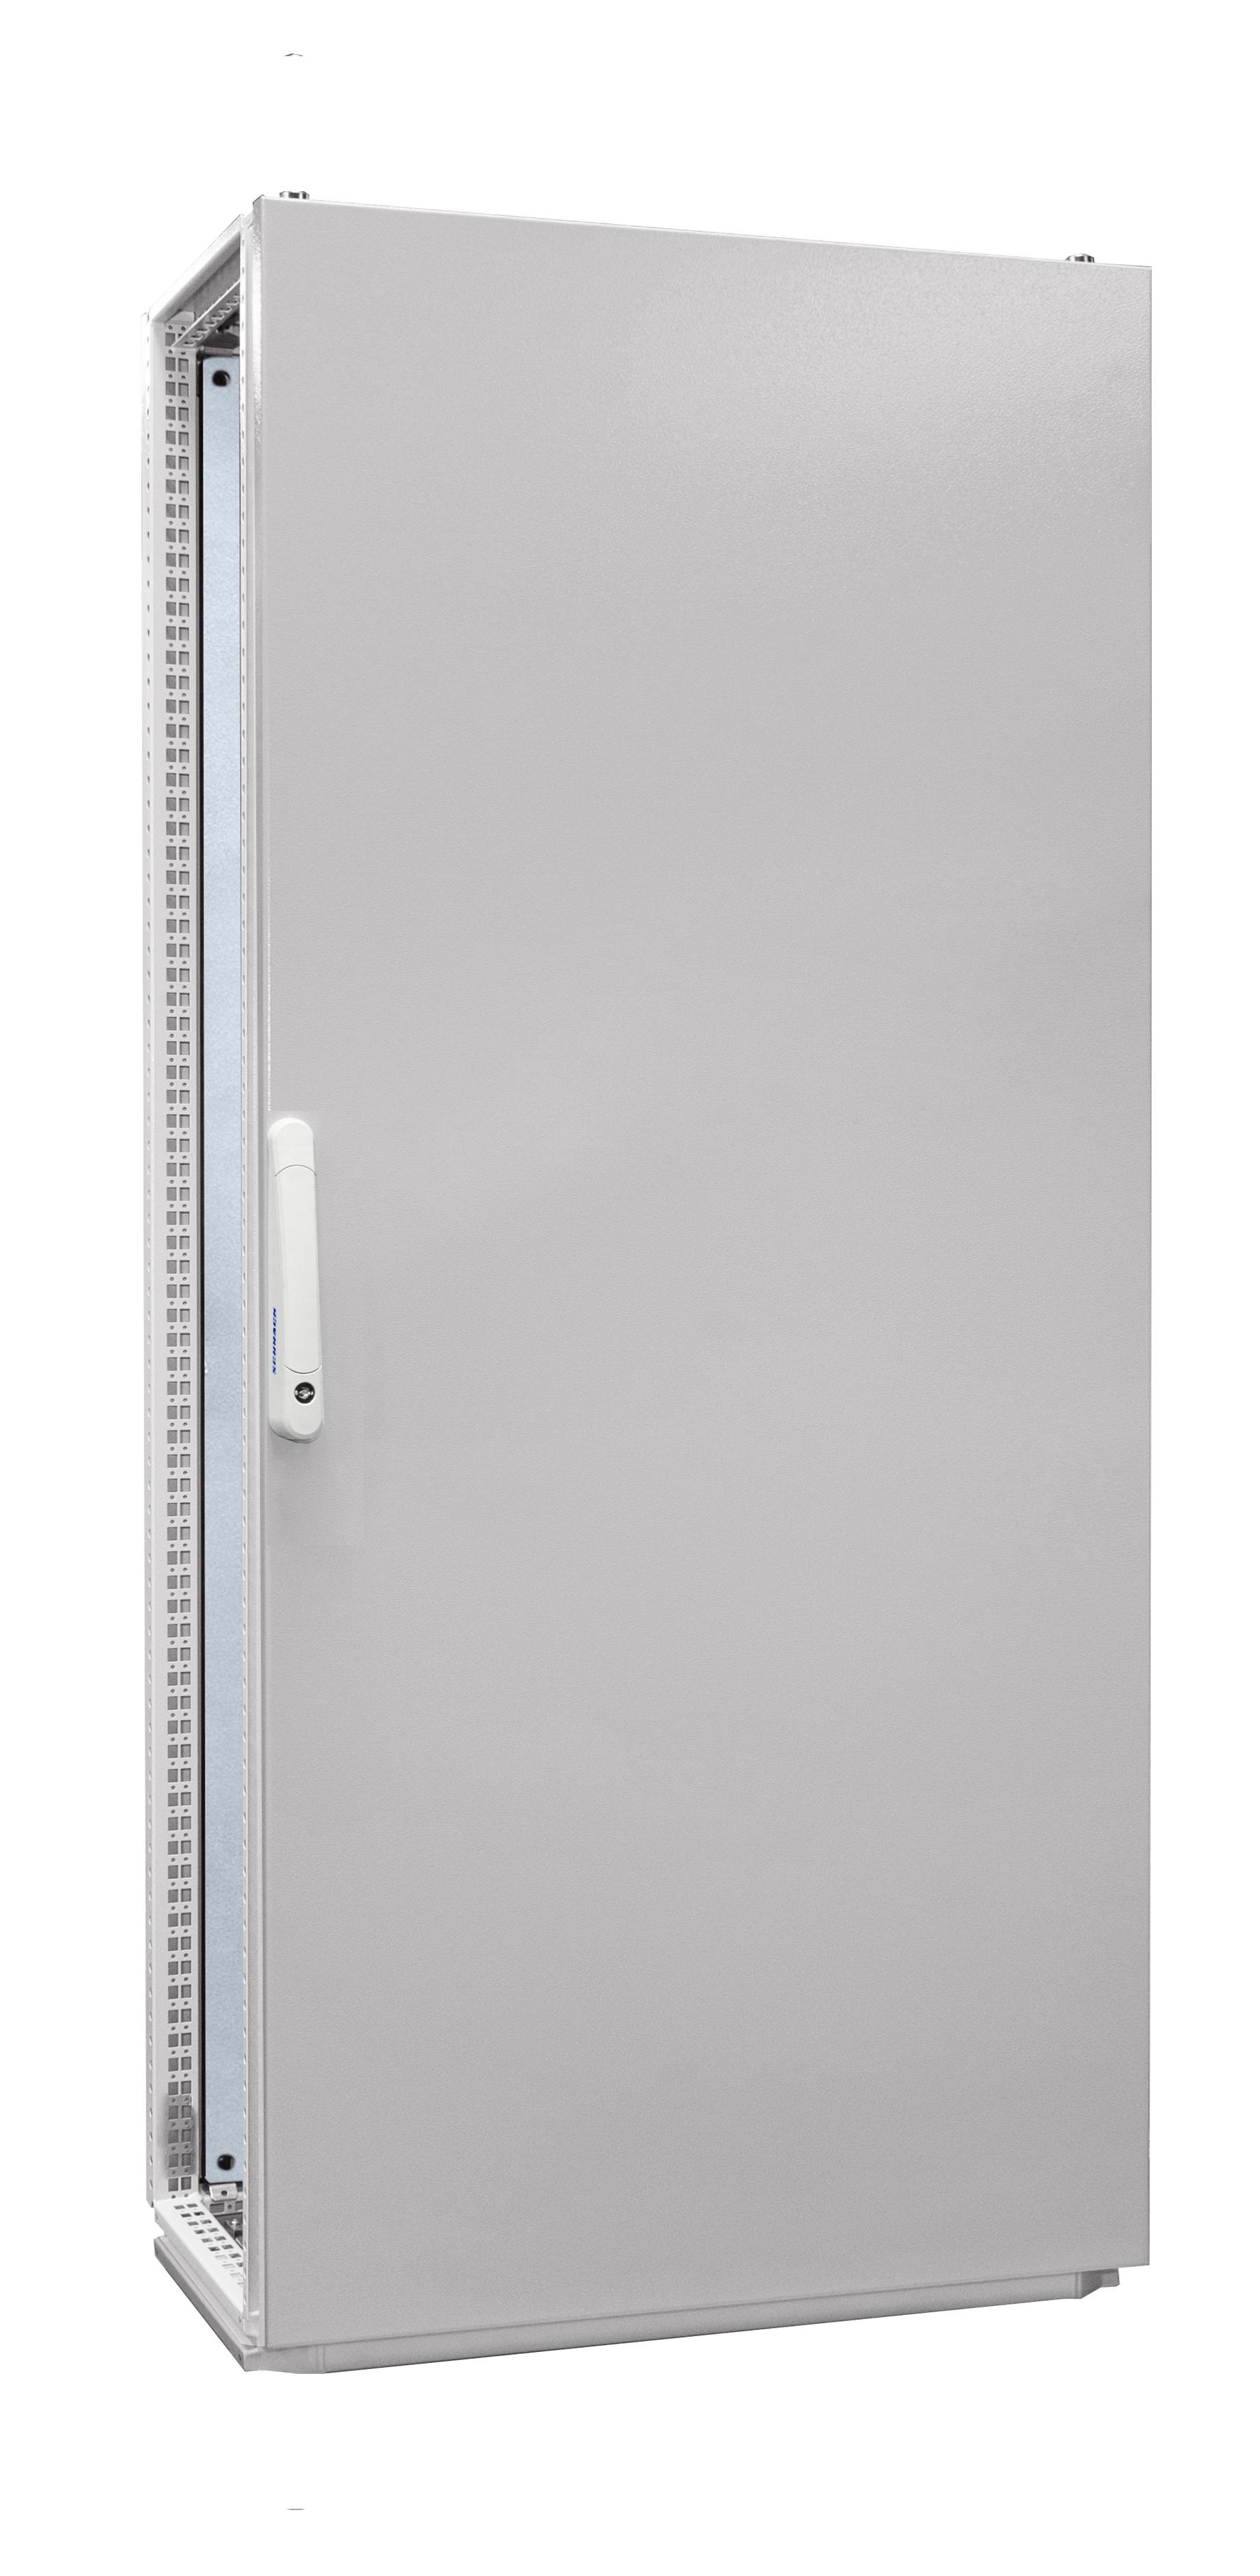 1 Stk Anreihschrank 1-Tür IP55 H=1800 B=800 T=400mm Stahlblech AC188040--